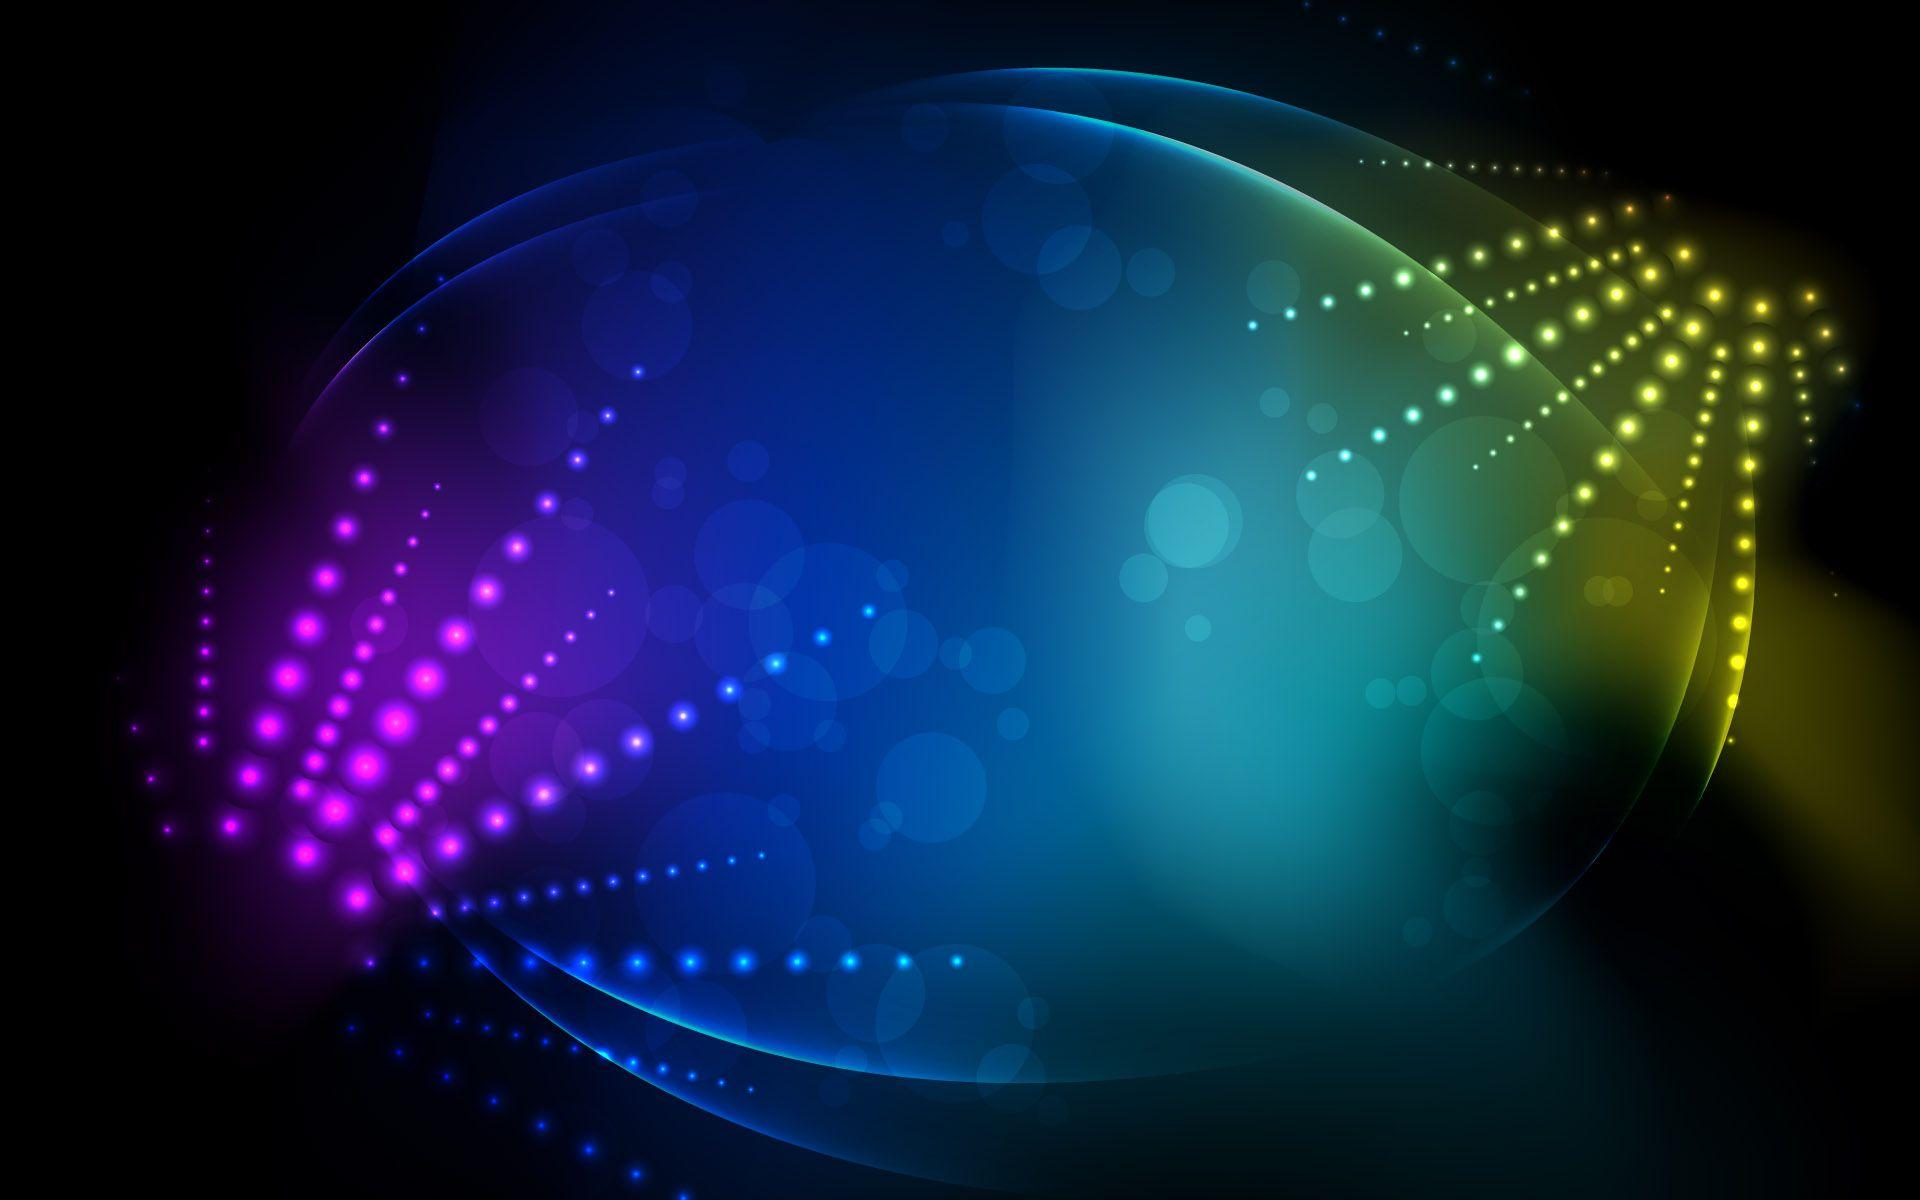 Imagen de luces de colores fondos de pantalla fondos de for Imagenes fondo escritorio